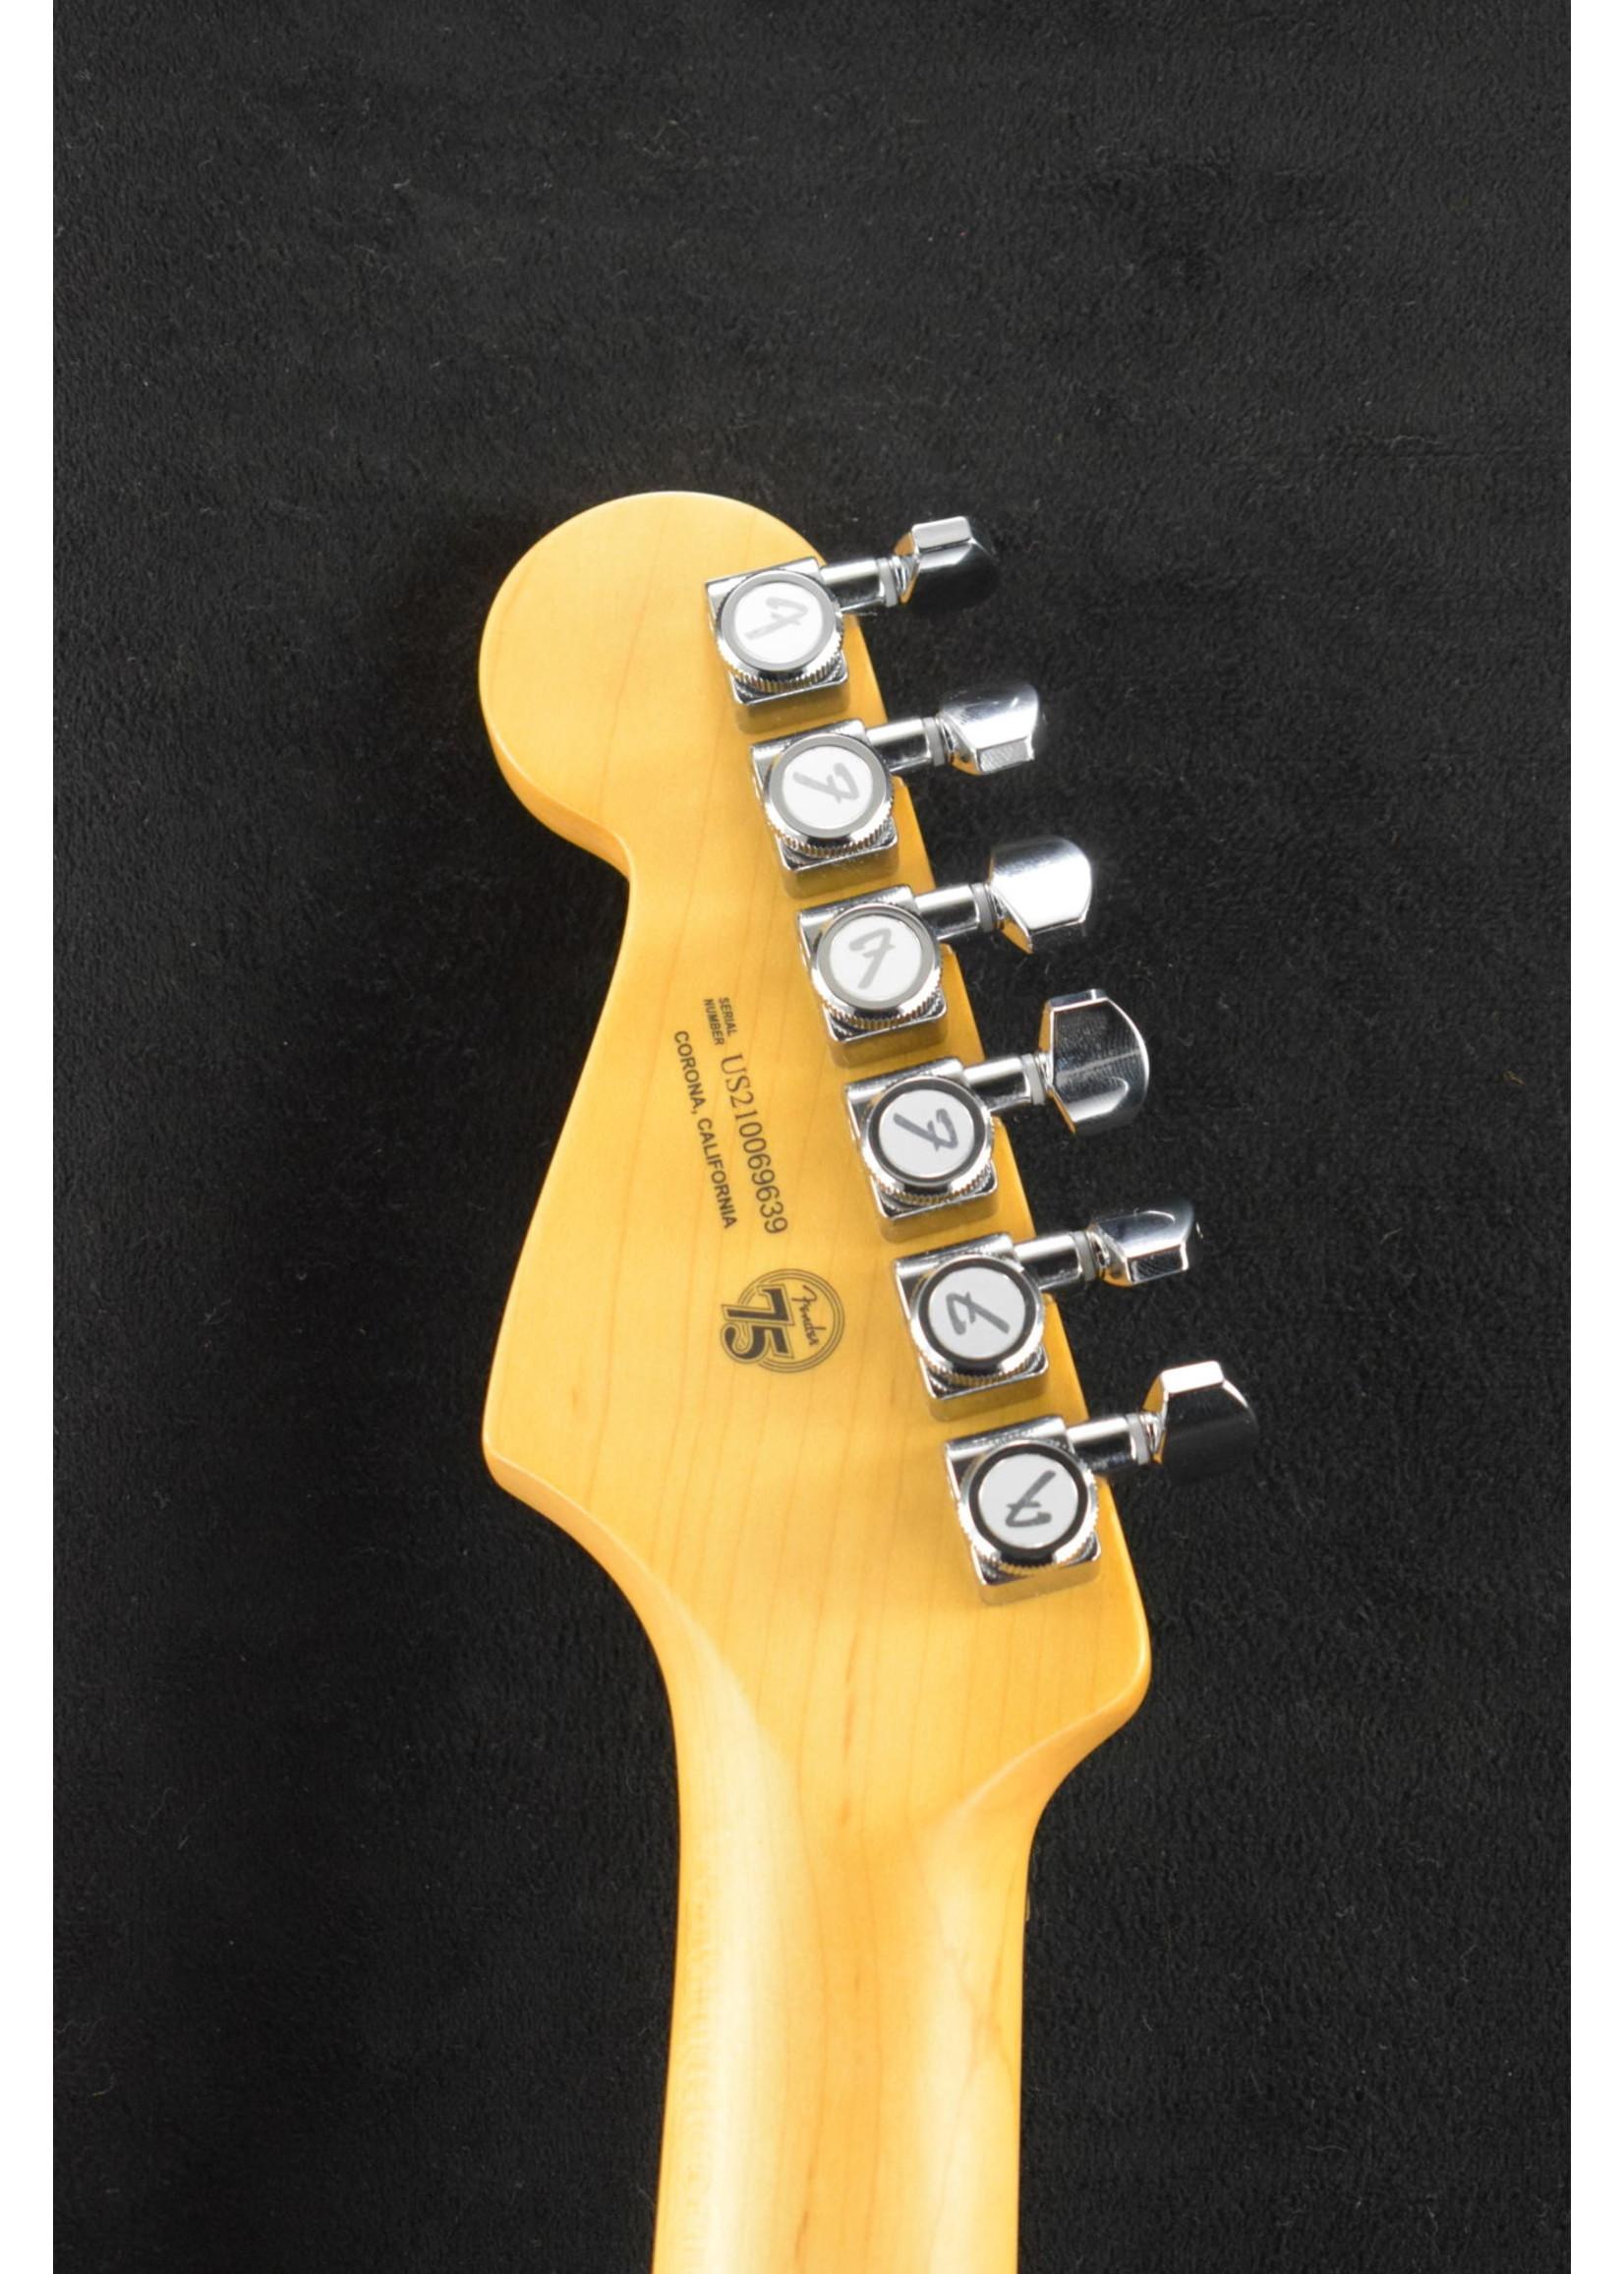 Fender Fender American Ultra Stratocaster Ultraburst Rosewood Fingerboard